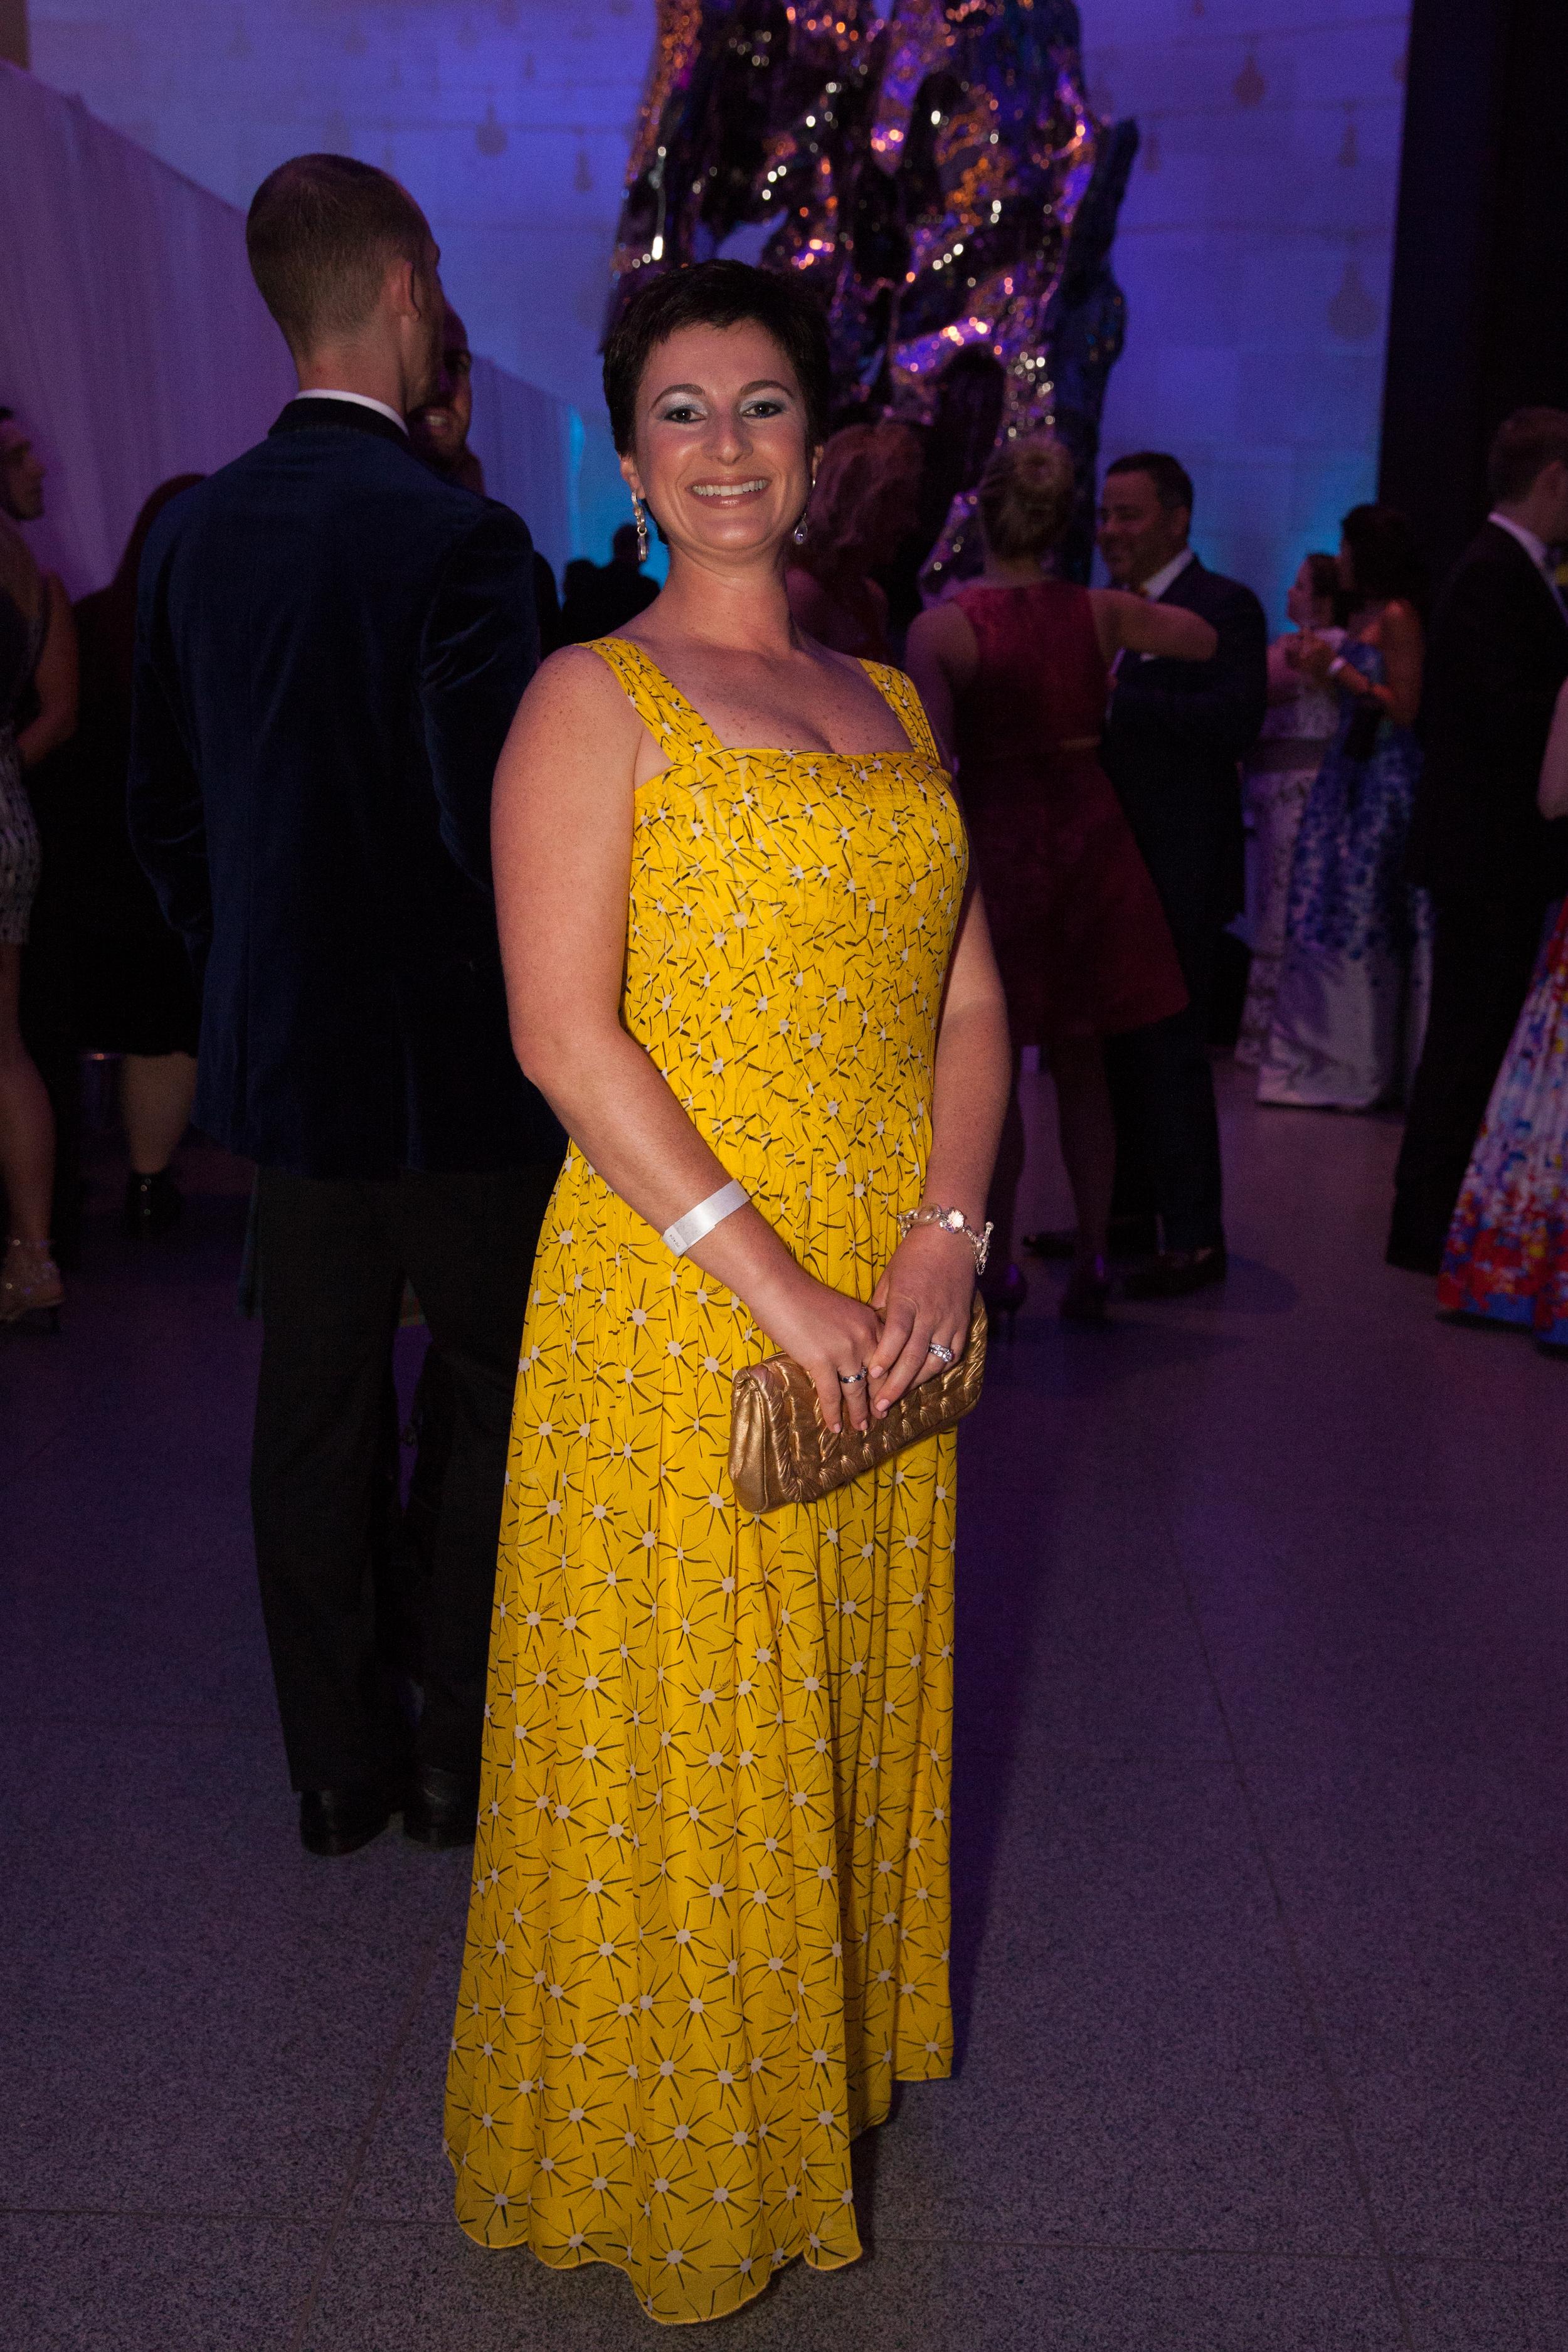 Marsha MacLean~ Diane von Furstenberg gown, Stephen Dwek jewelery.